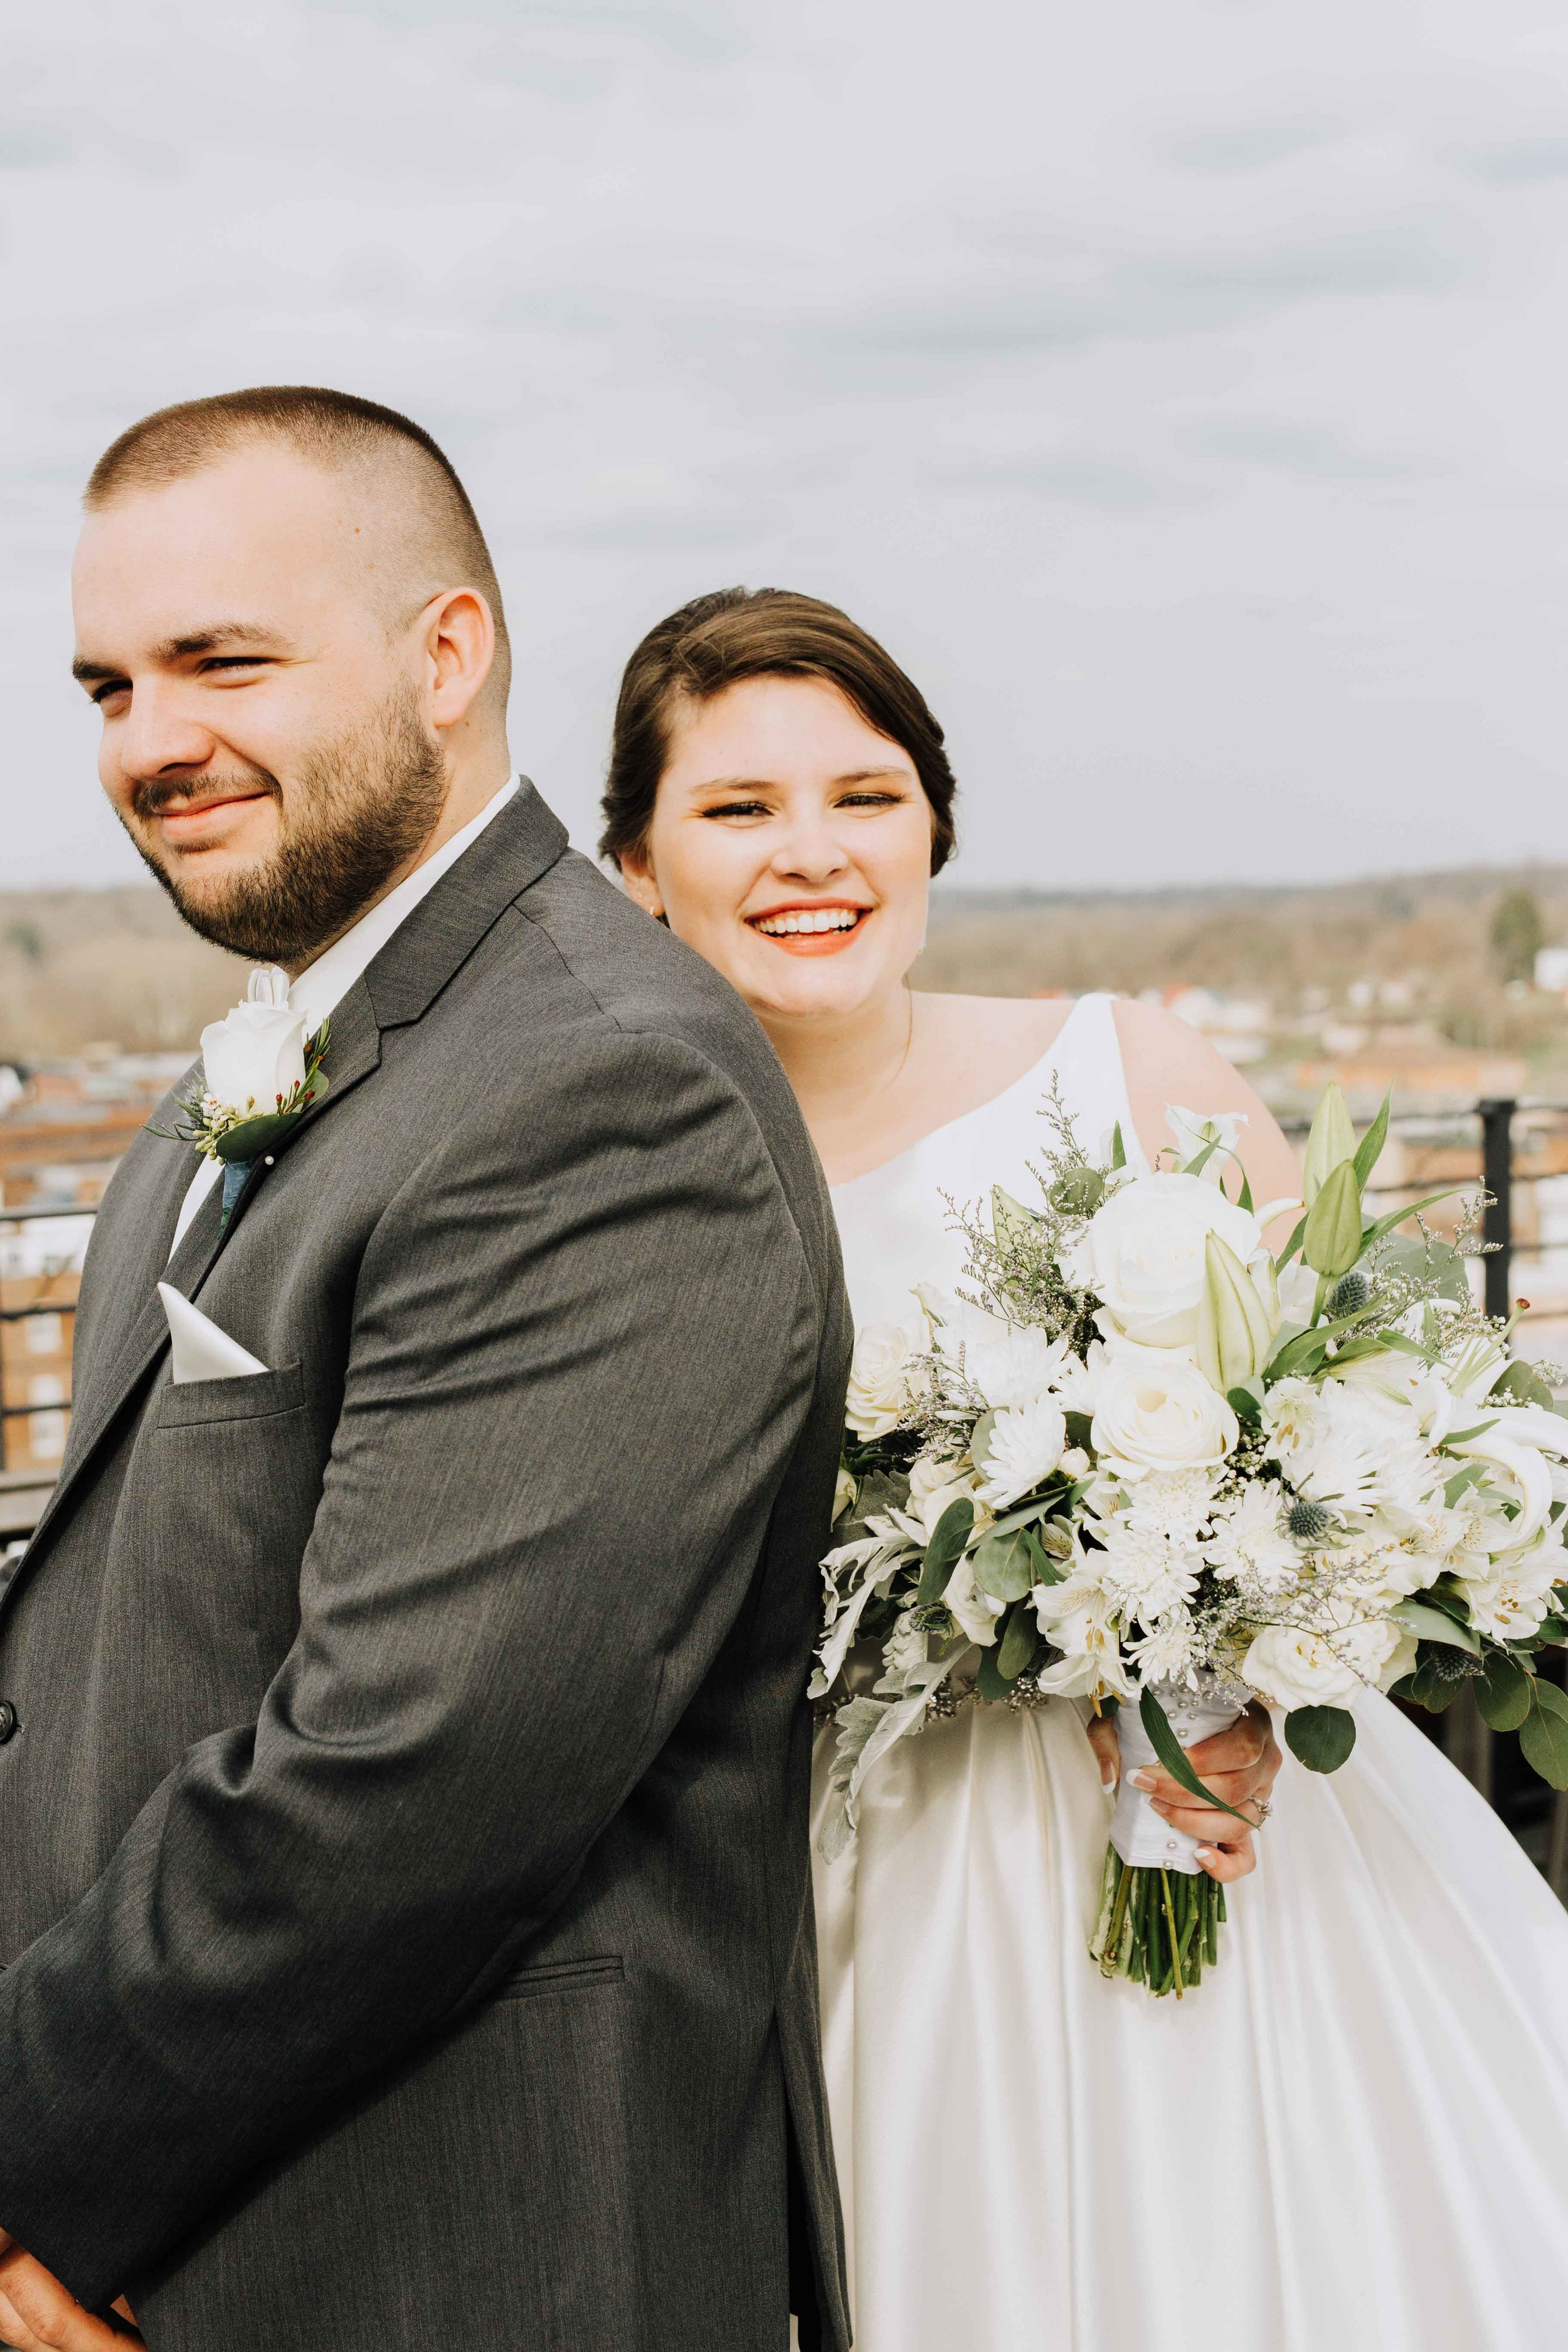 Farmville-Virginia-Wedding-Hotel-Weynoke-Downtown-Jacqueline-Waters-Photography-Detailed- (522).jpg